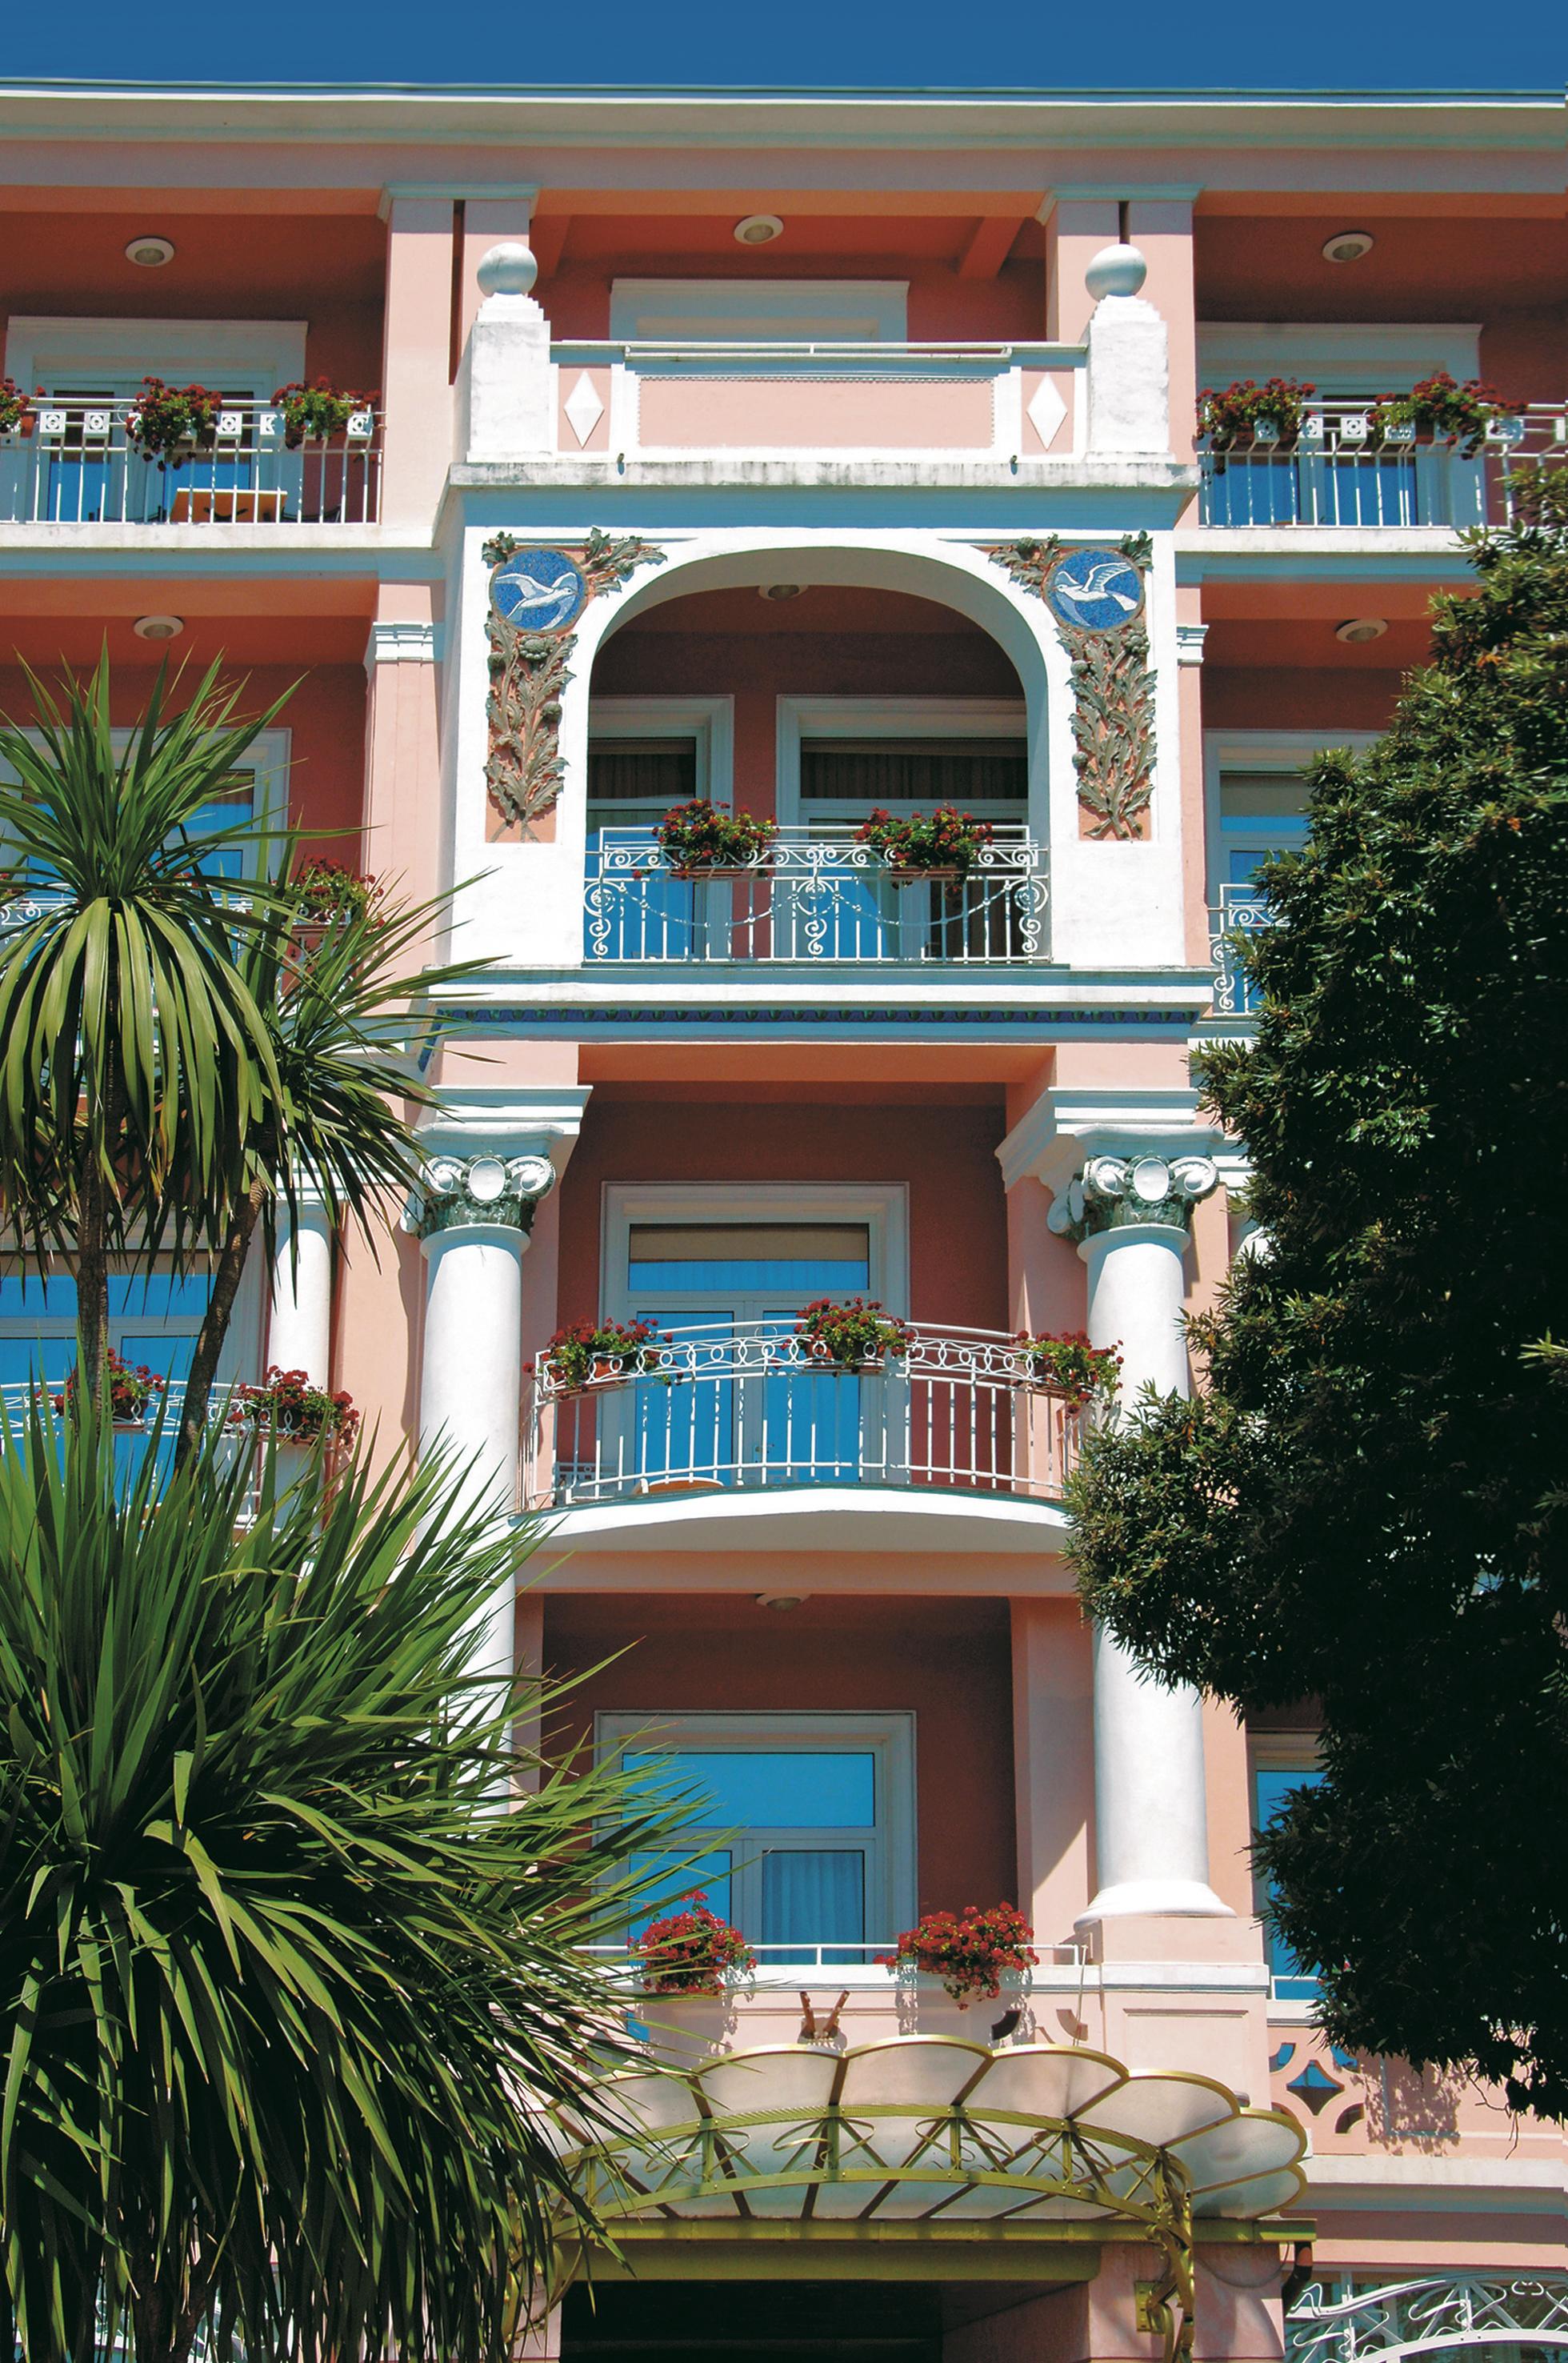 Mozart Hotel Renco Kosinozic